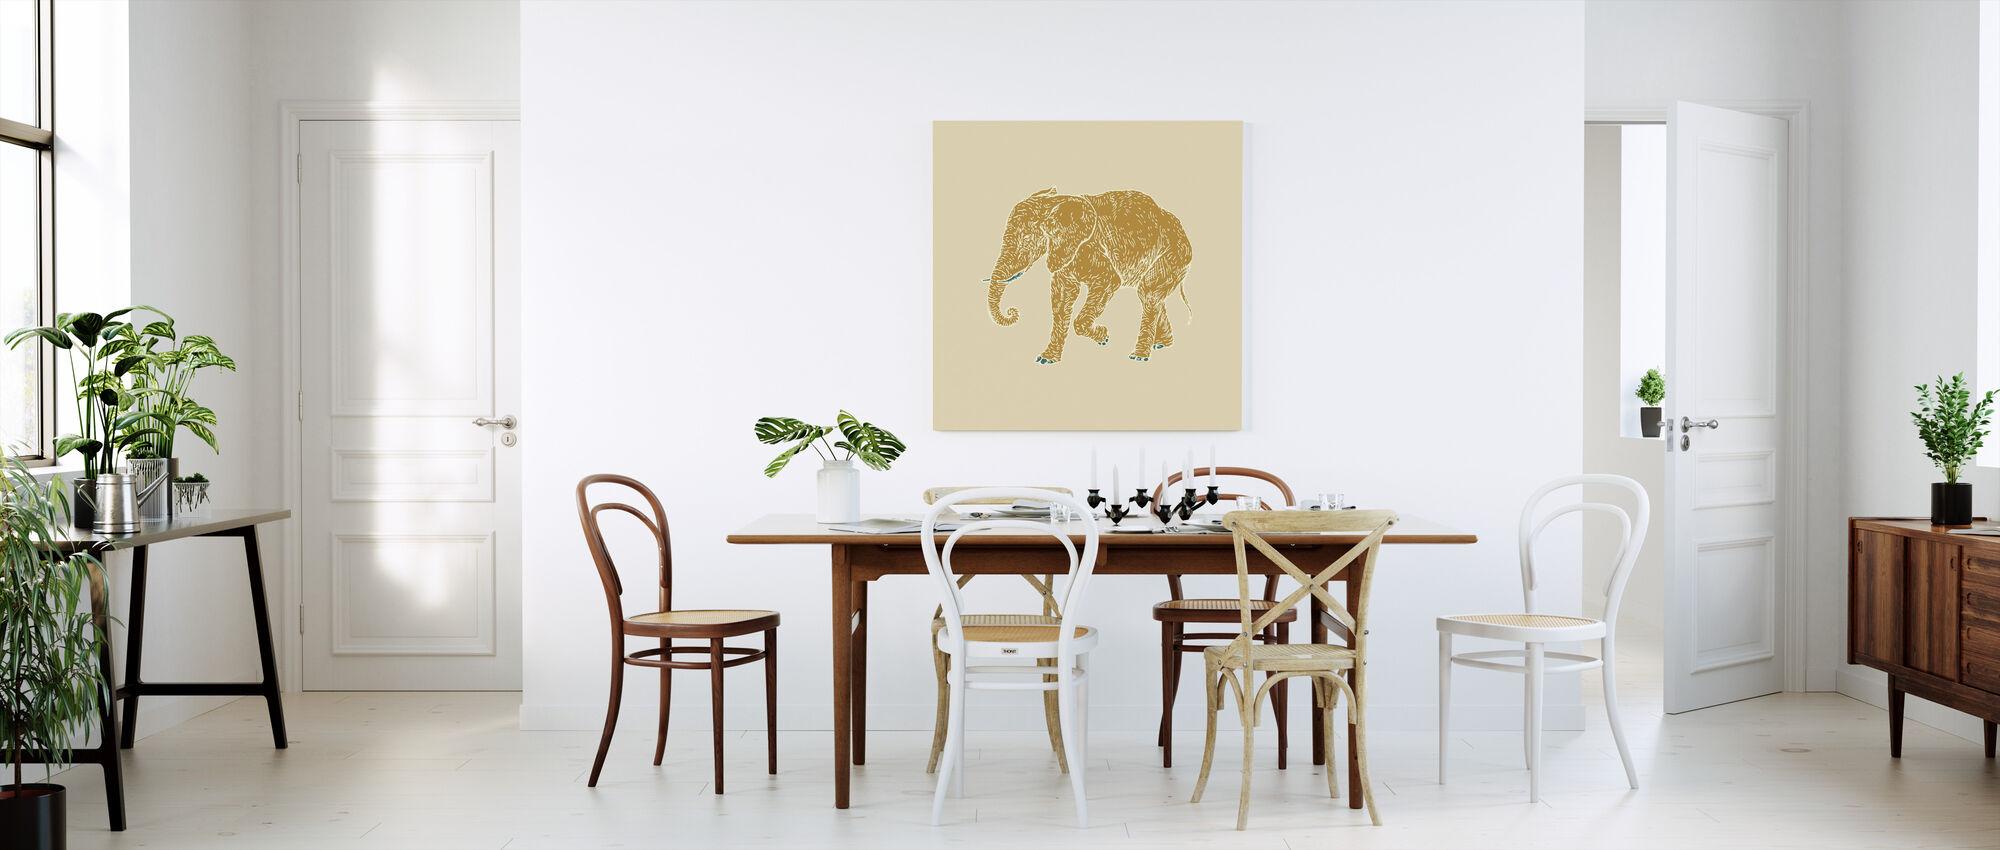 Olifant Ochtend - Canvas print - Keuken